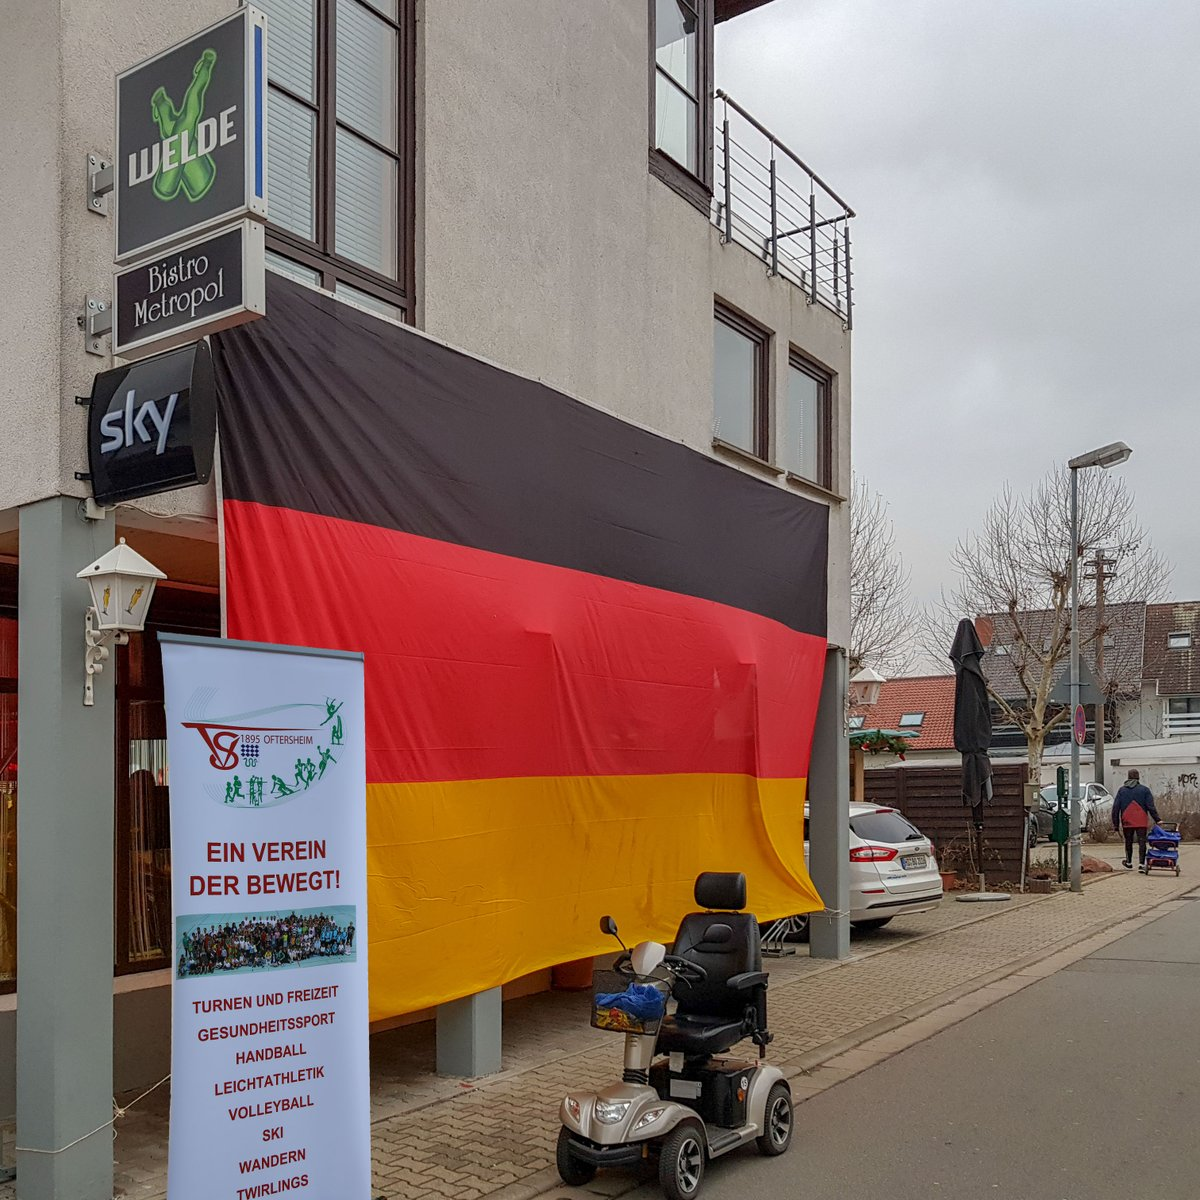 tsvoftersheim photo